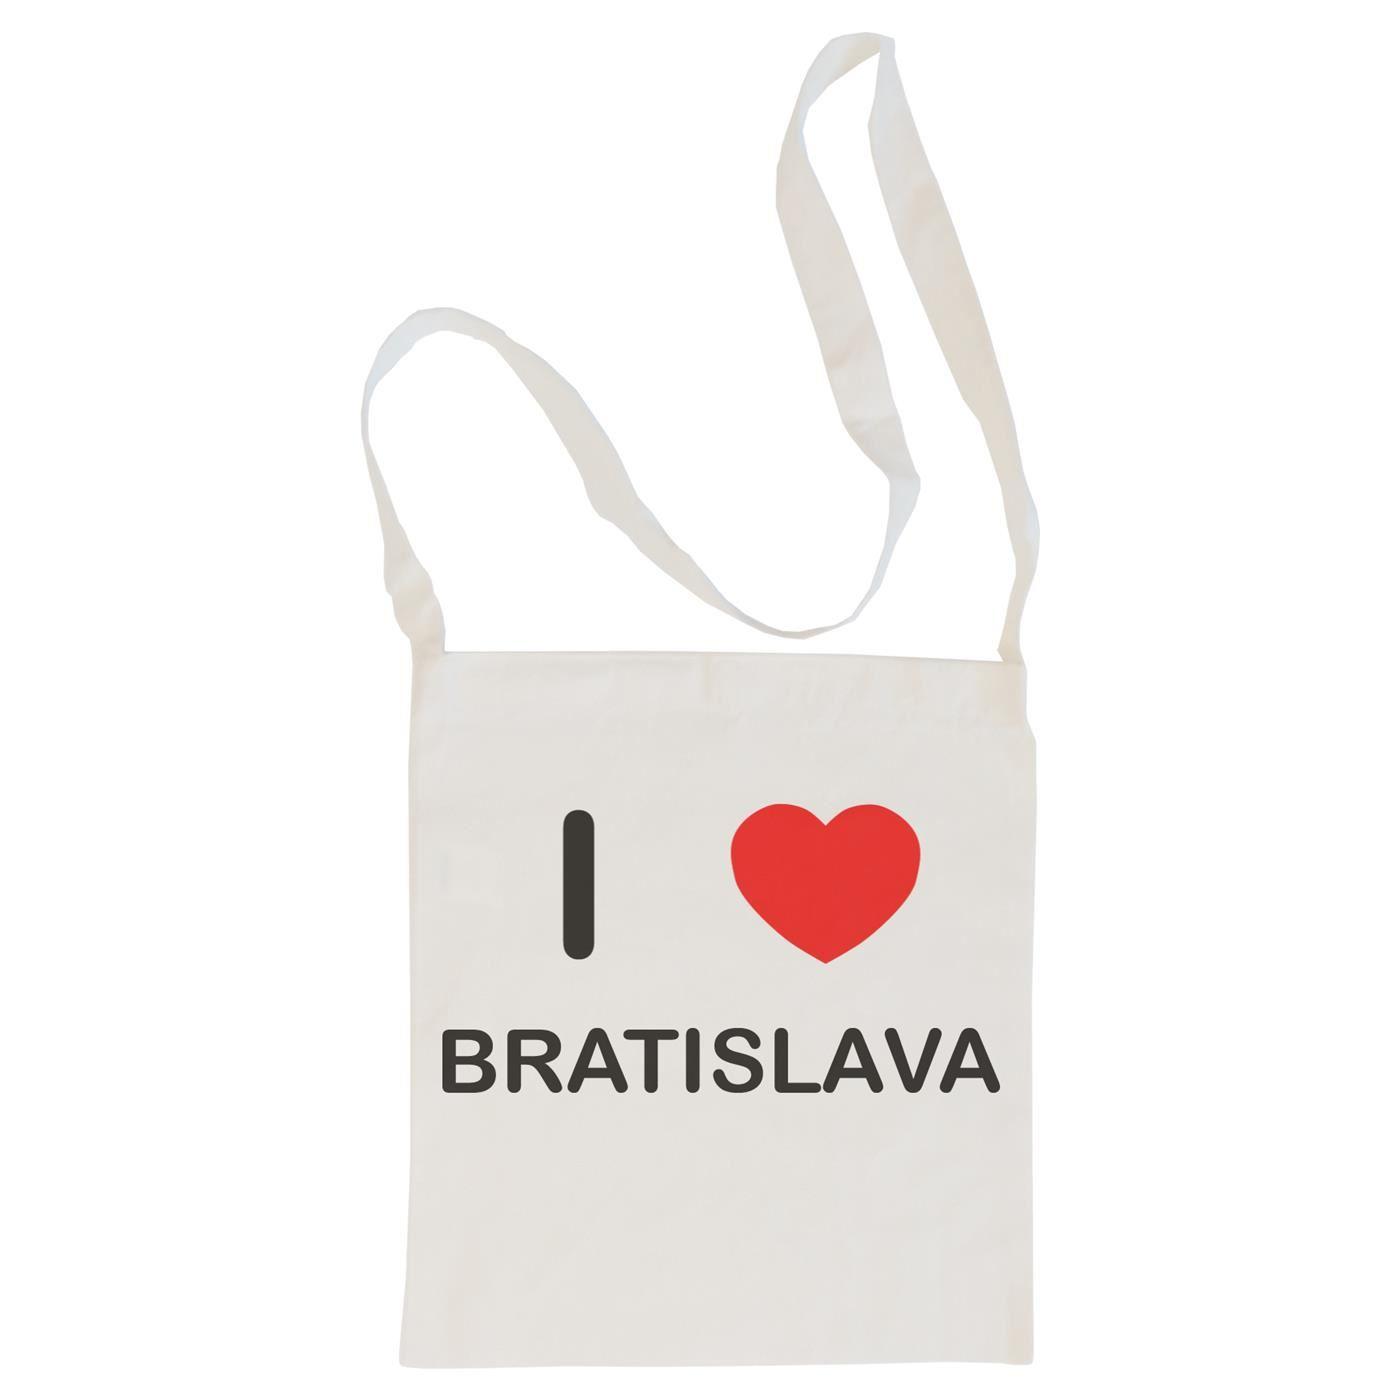 I Love Bratislava - Cotton Bag | Size choice Tote, Shopper or Sling